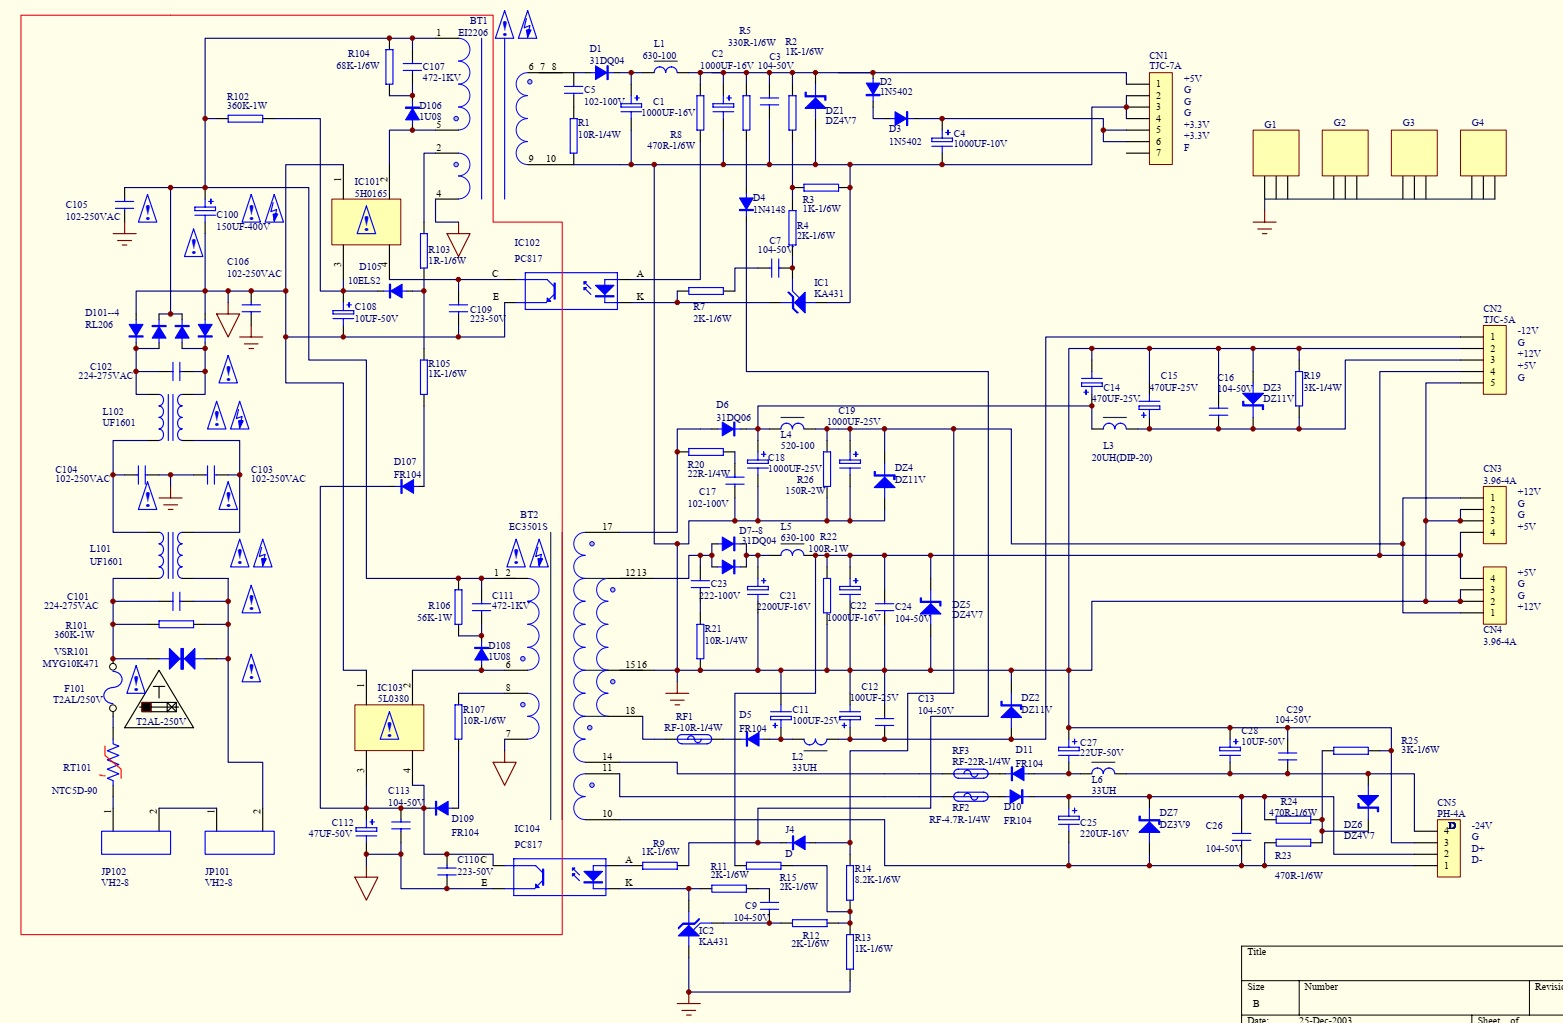 belson lcd tv powell i es6128 es7010 circuit diagram schematic full  [ 1563 x 1023 Pixel ]